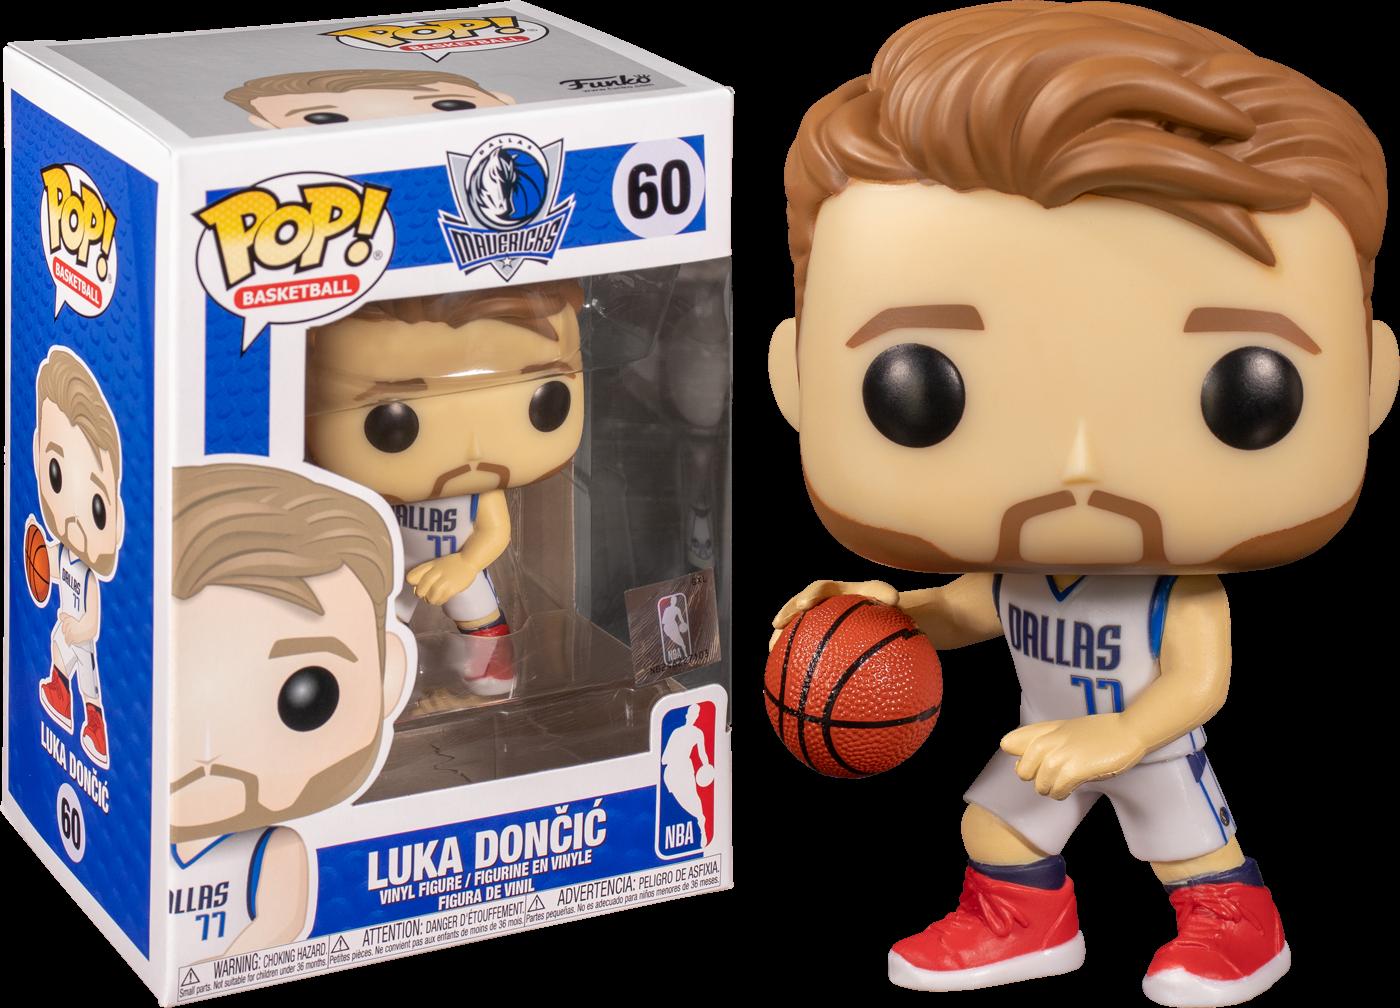 NBA: Mavericks - Luka Doncic Pop! Vinyl